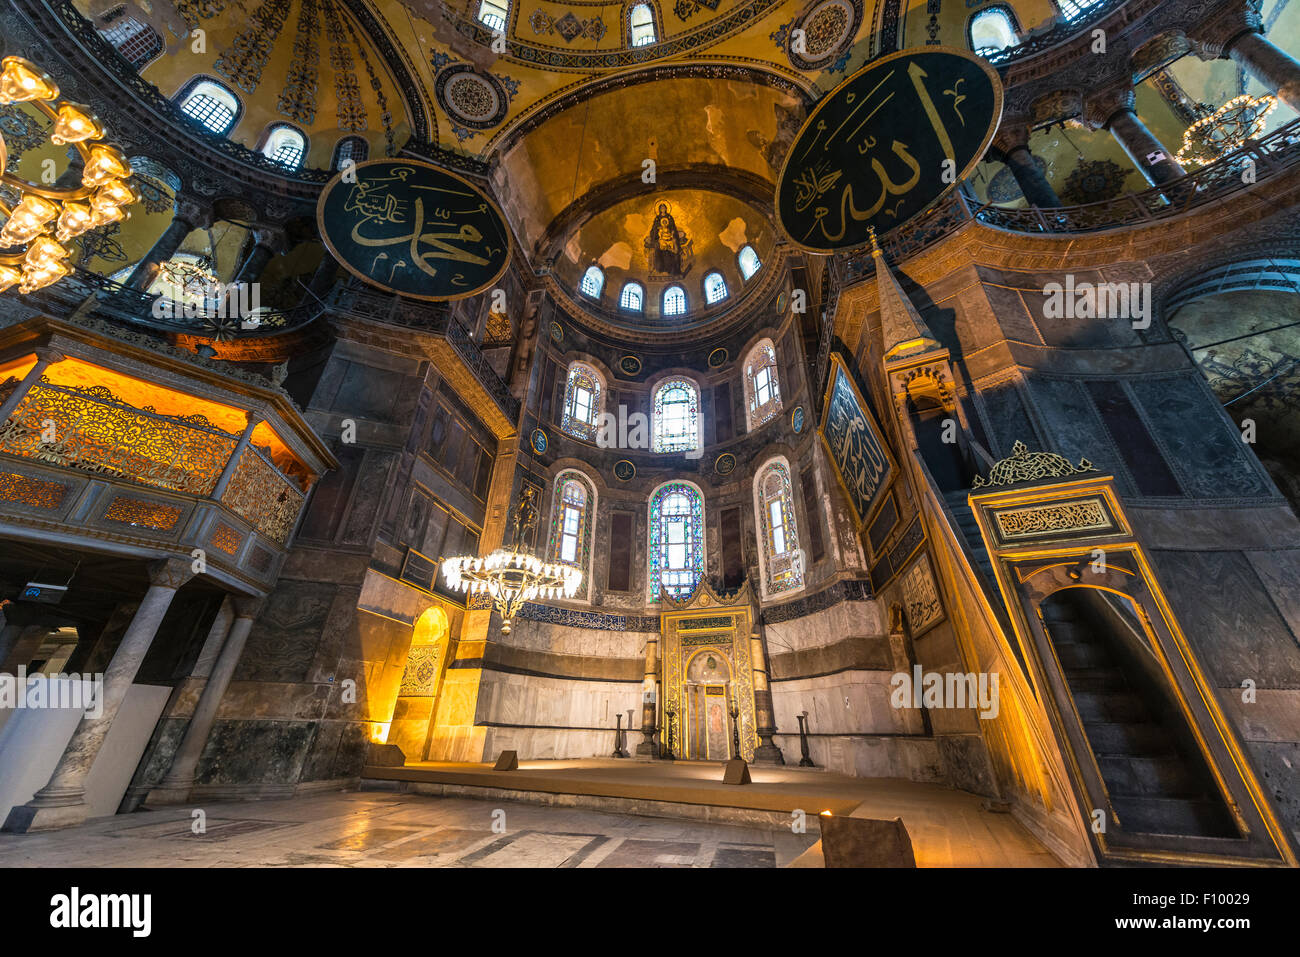 Hauptbereich der Hagia Sophia, Ayasofya, Interieur, UNESCO-Weltkulturerbe, europäische Seite, Istanbul, Türkei Stockbild